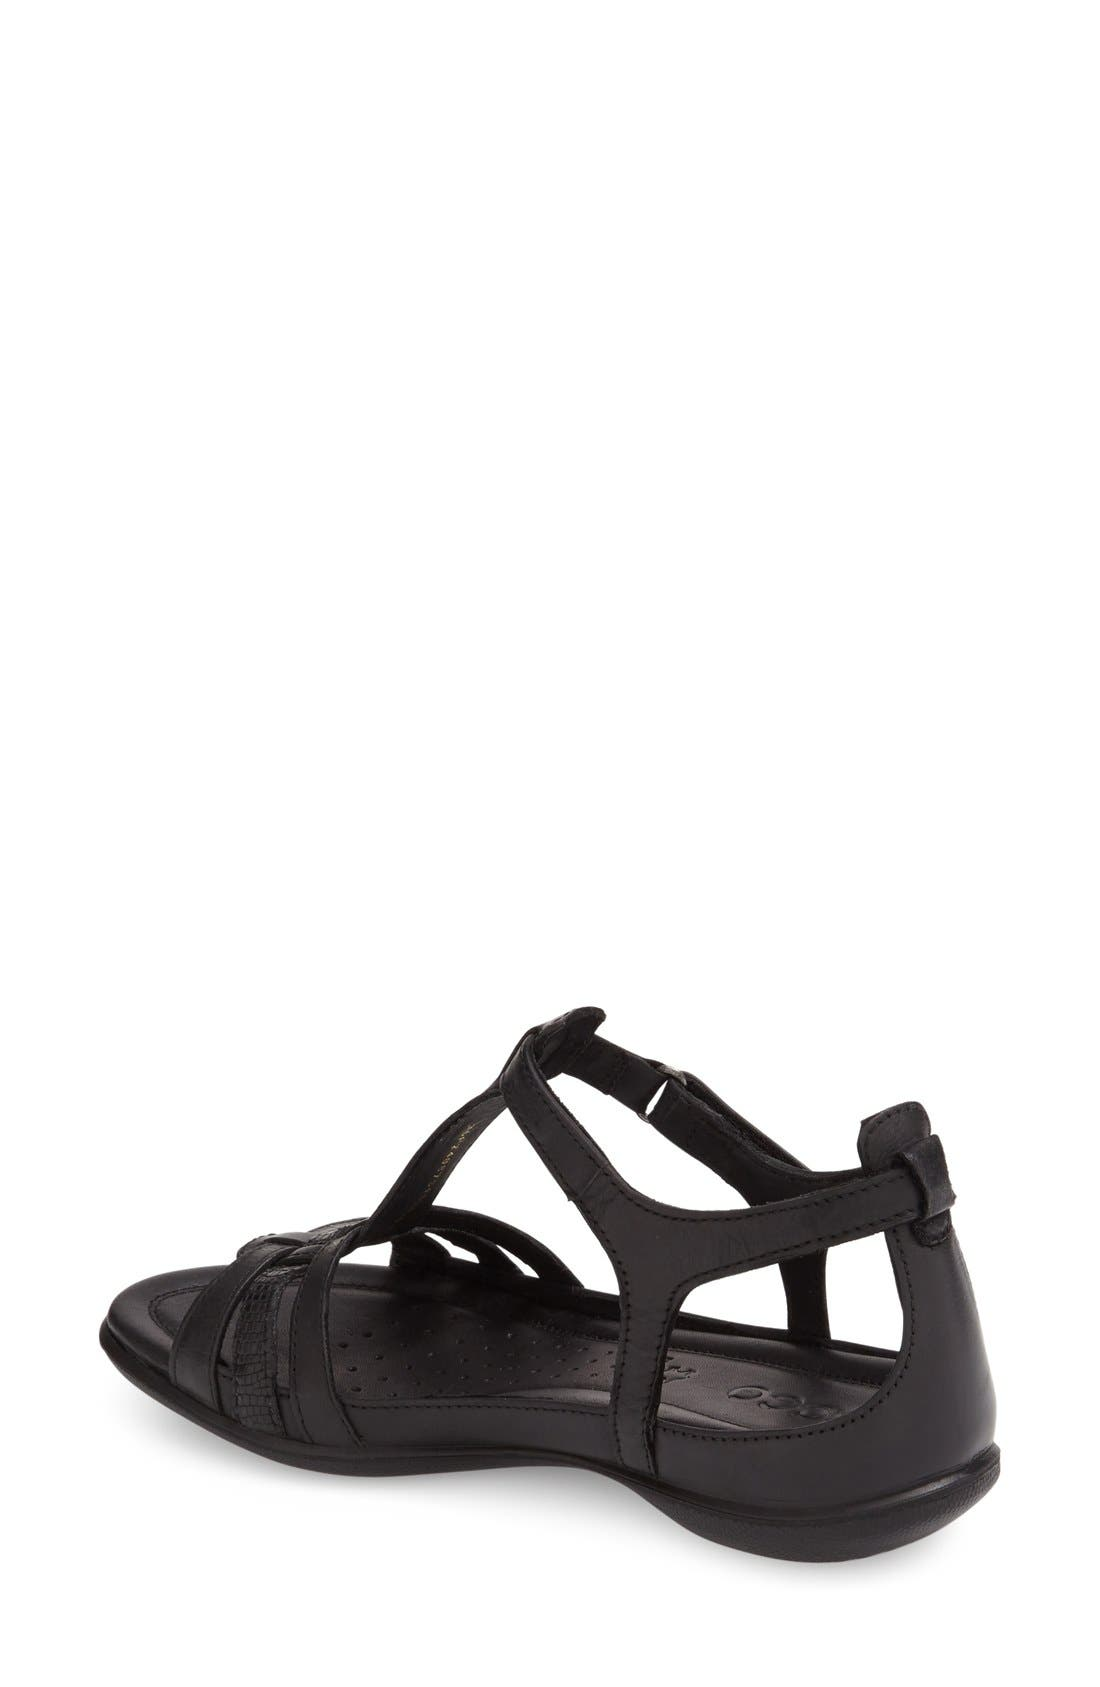 Alternate Image 2  - ECCO 'Flash' Sandal (Women)